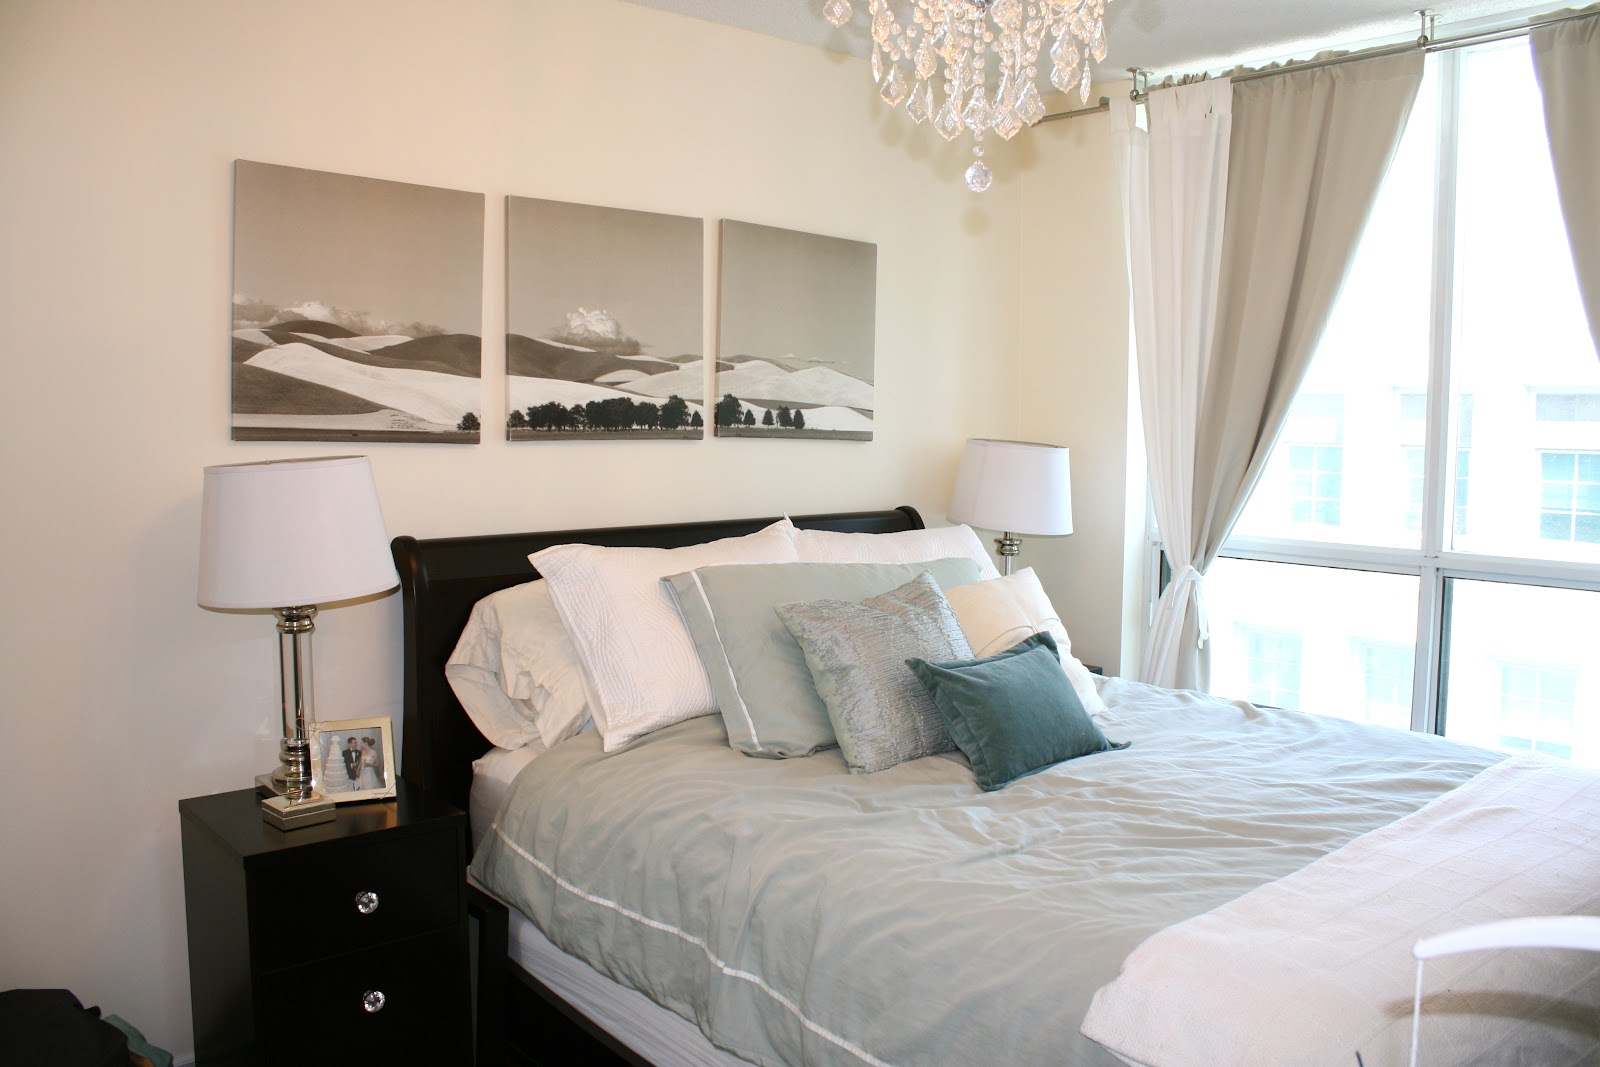 Simcoe street condo master bedroom tour for Condo bedroom design